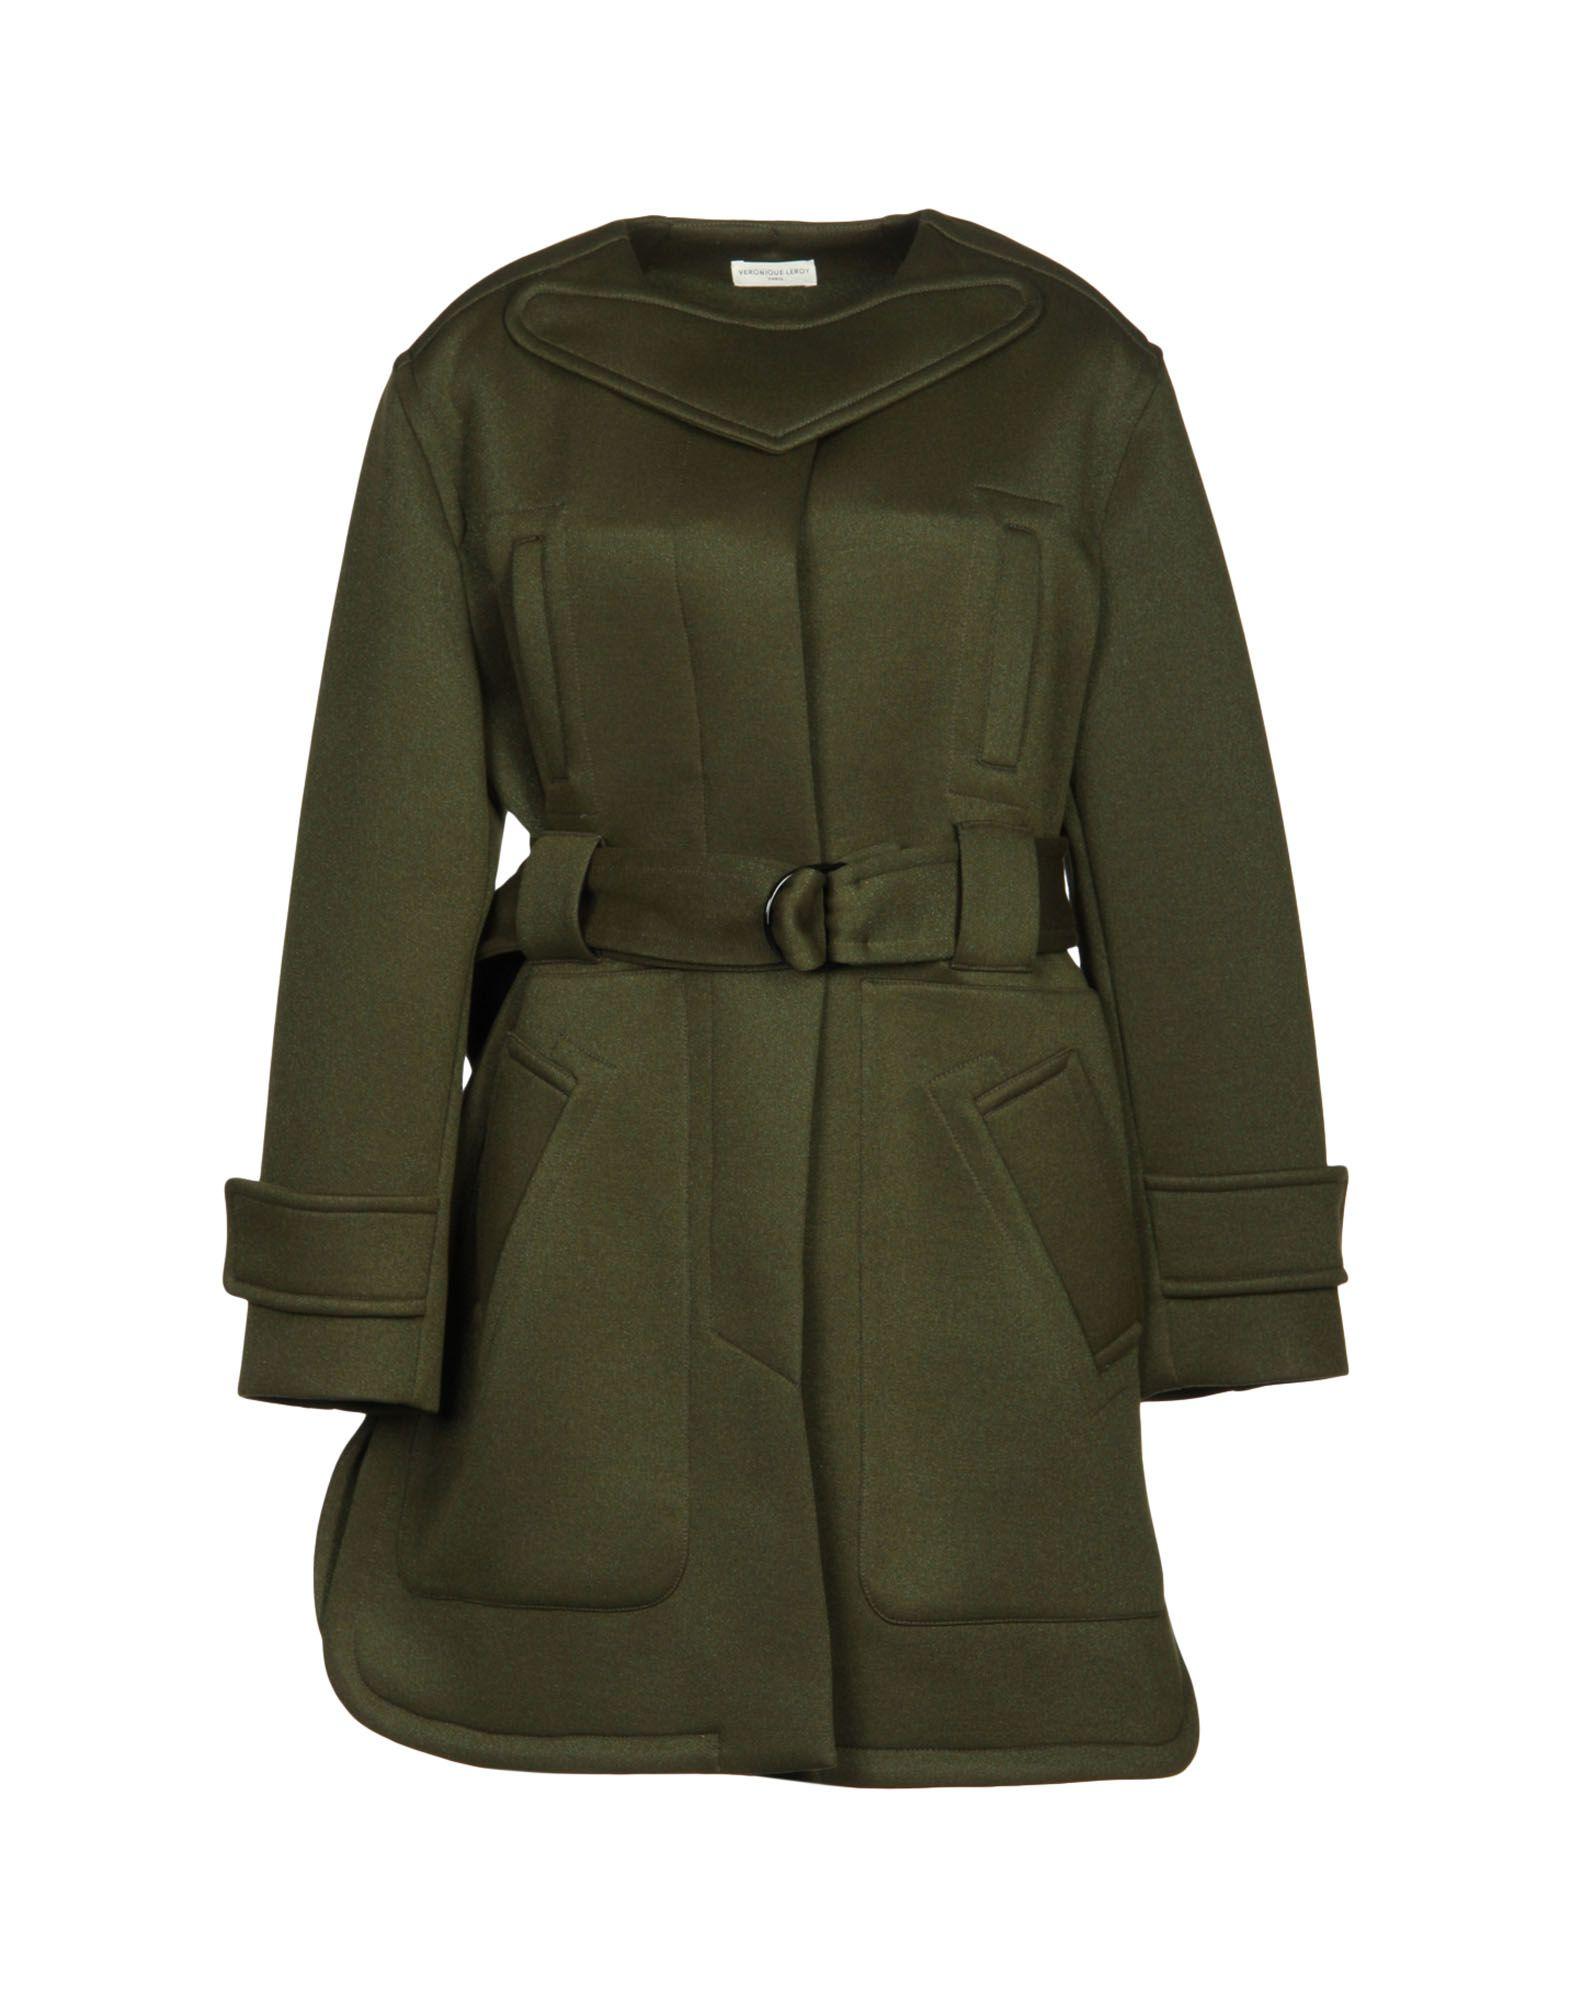 VERONIQUE LEROY Coats in Military Green